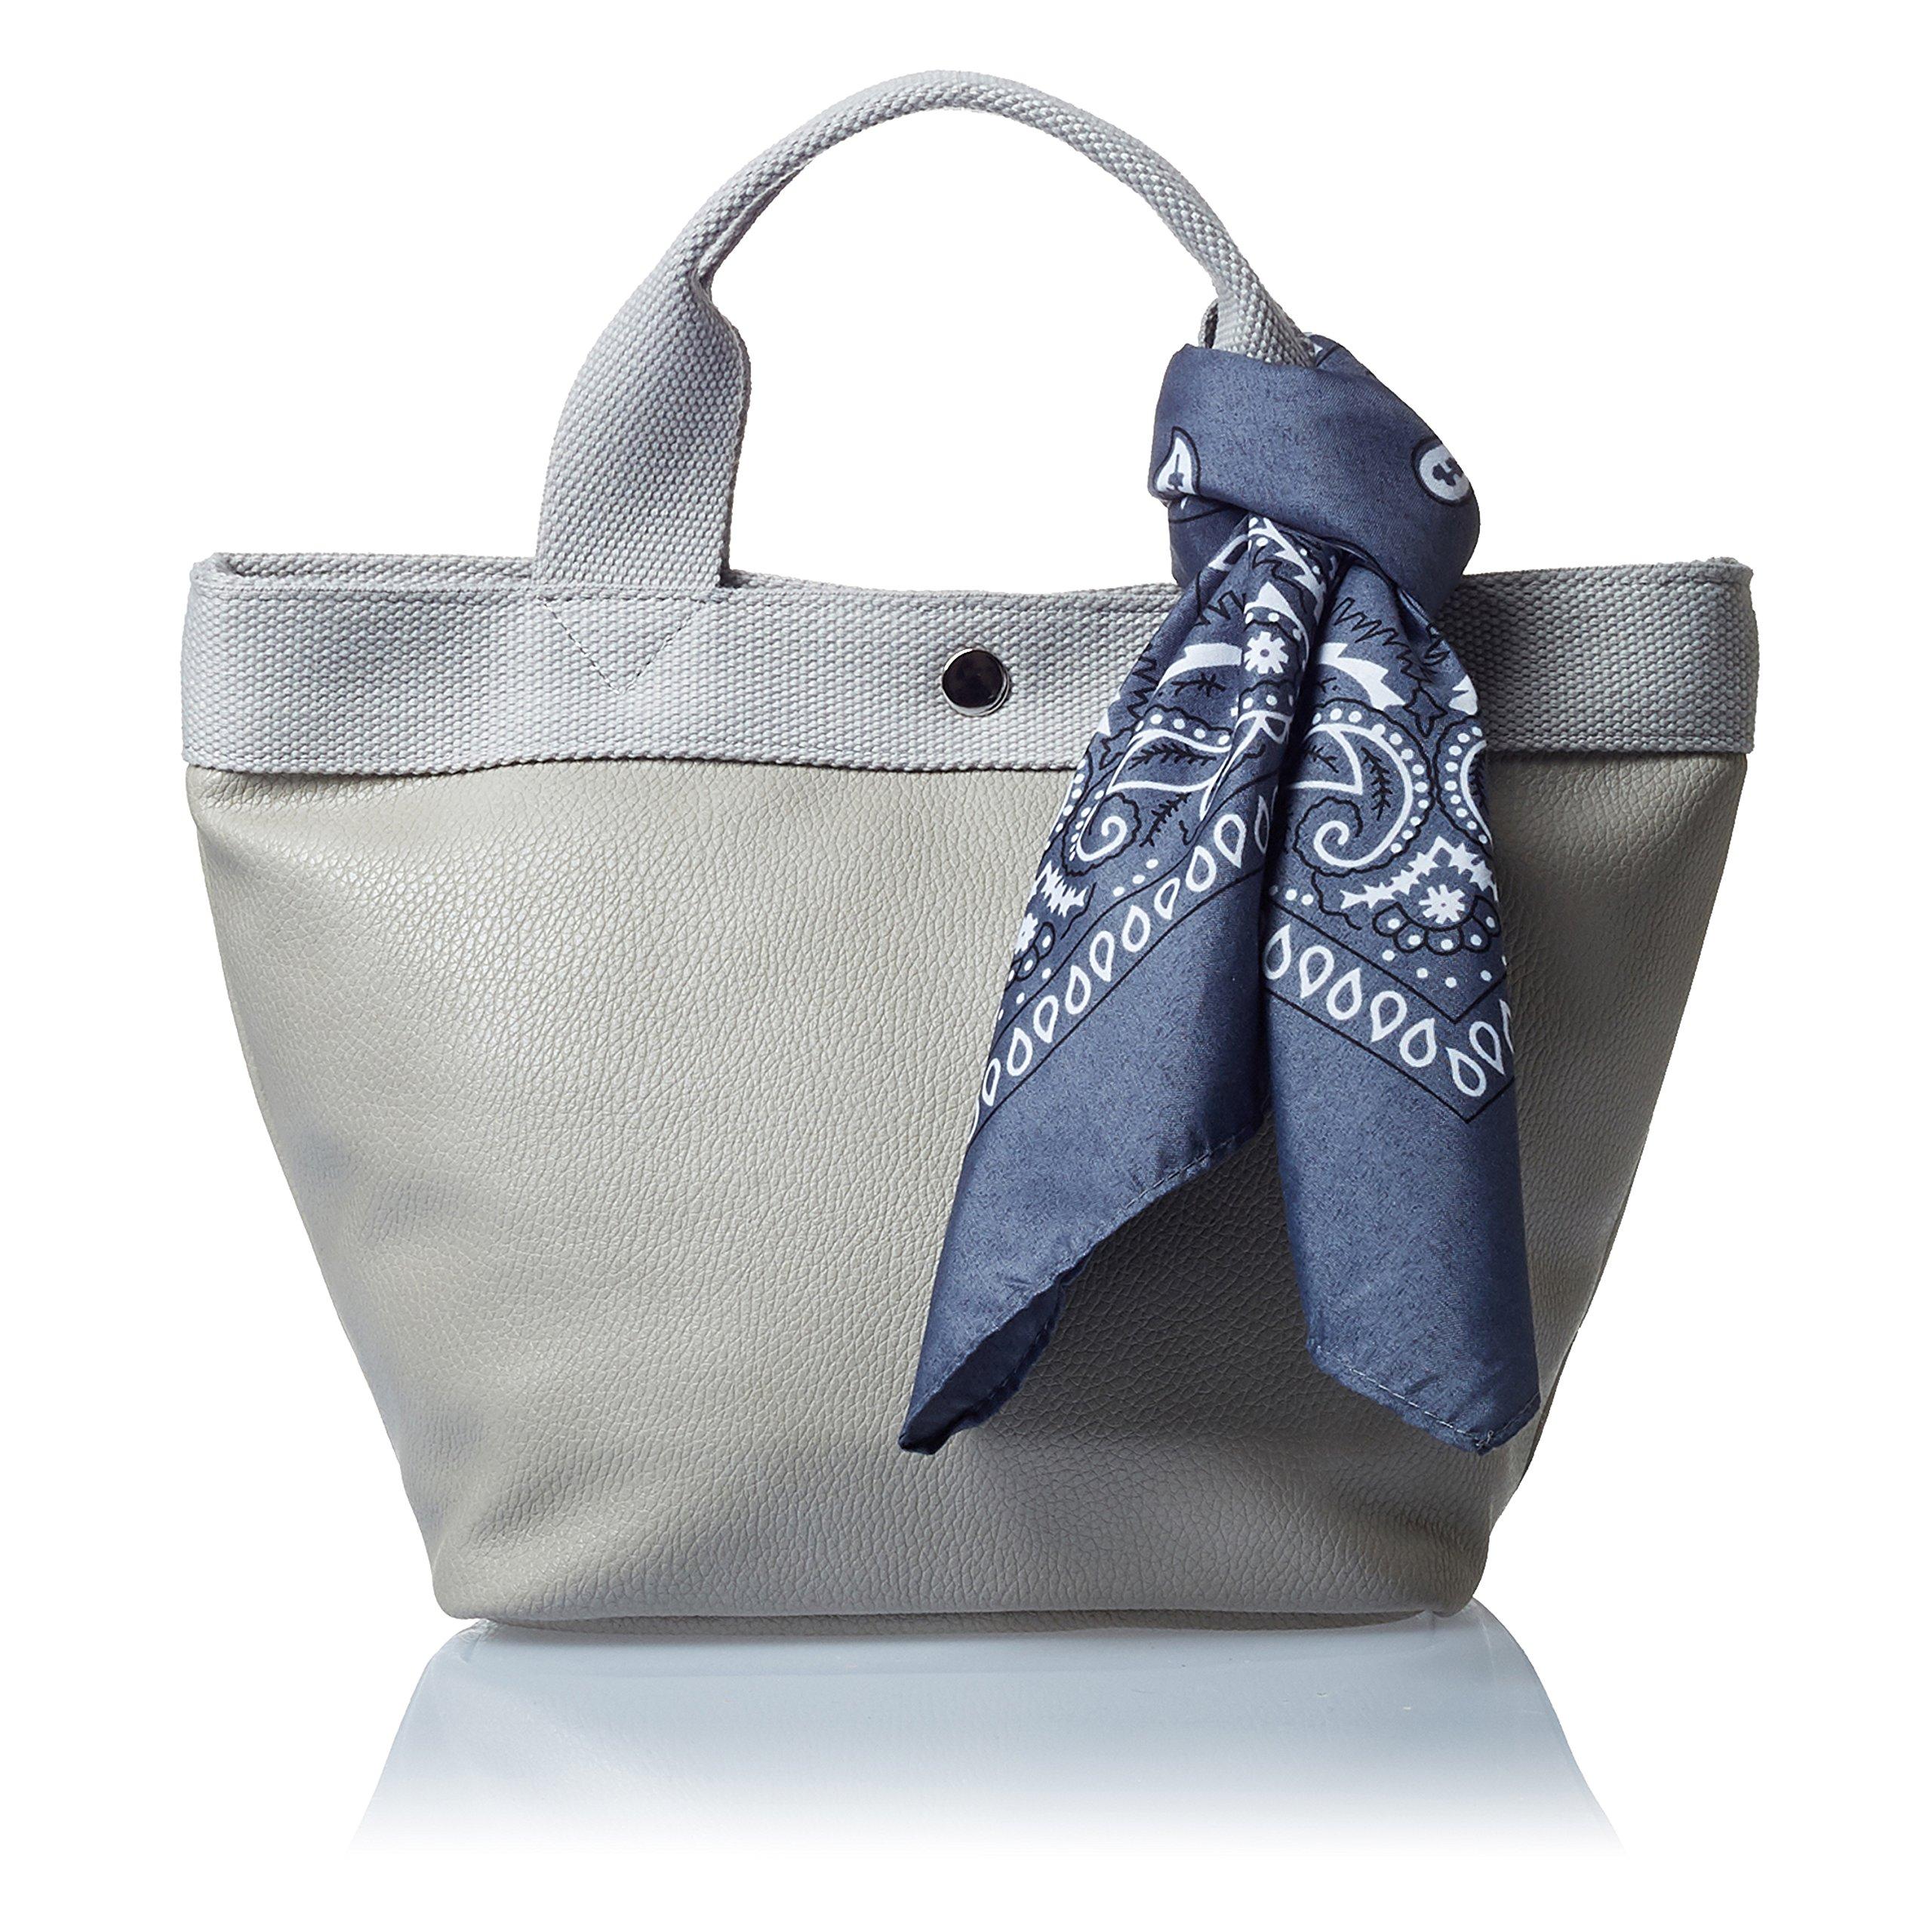 OUI TOTE Wytote Women's Tote Bag (Gray s)